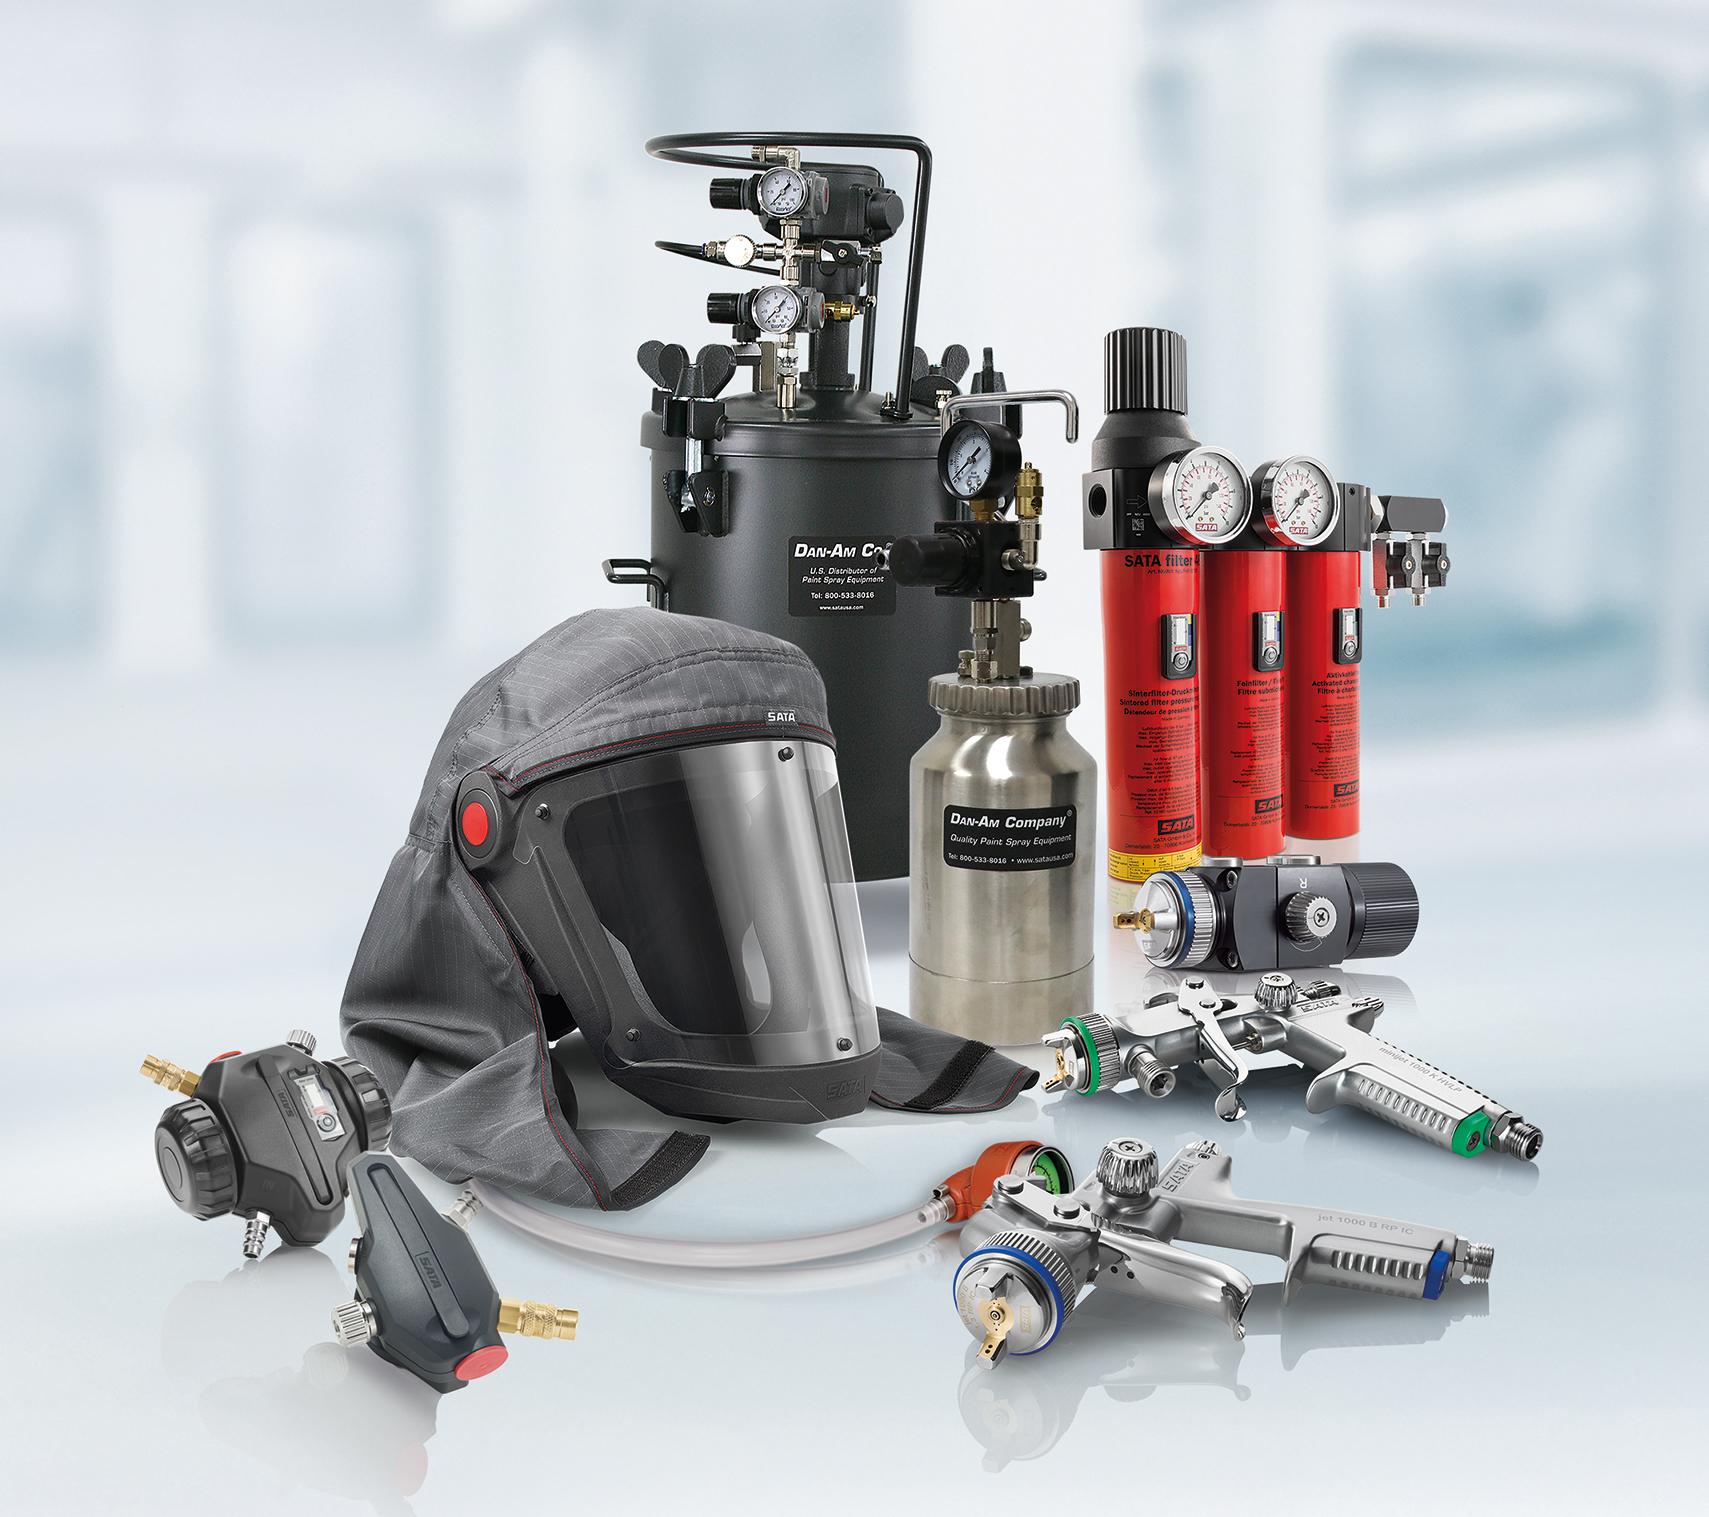 Spray Equipment Engineered for Durability